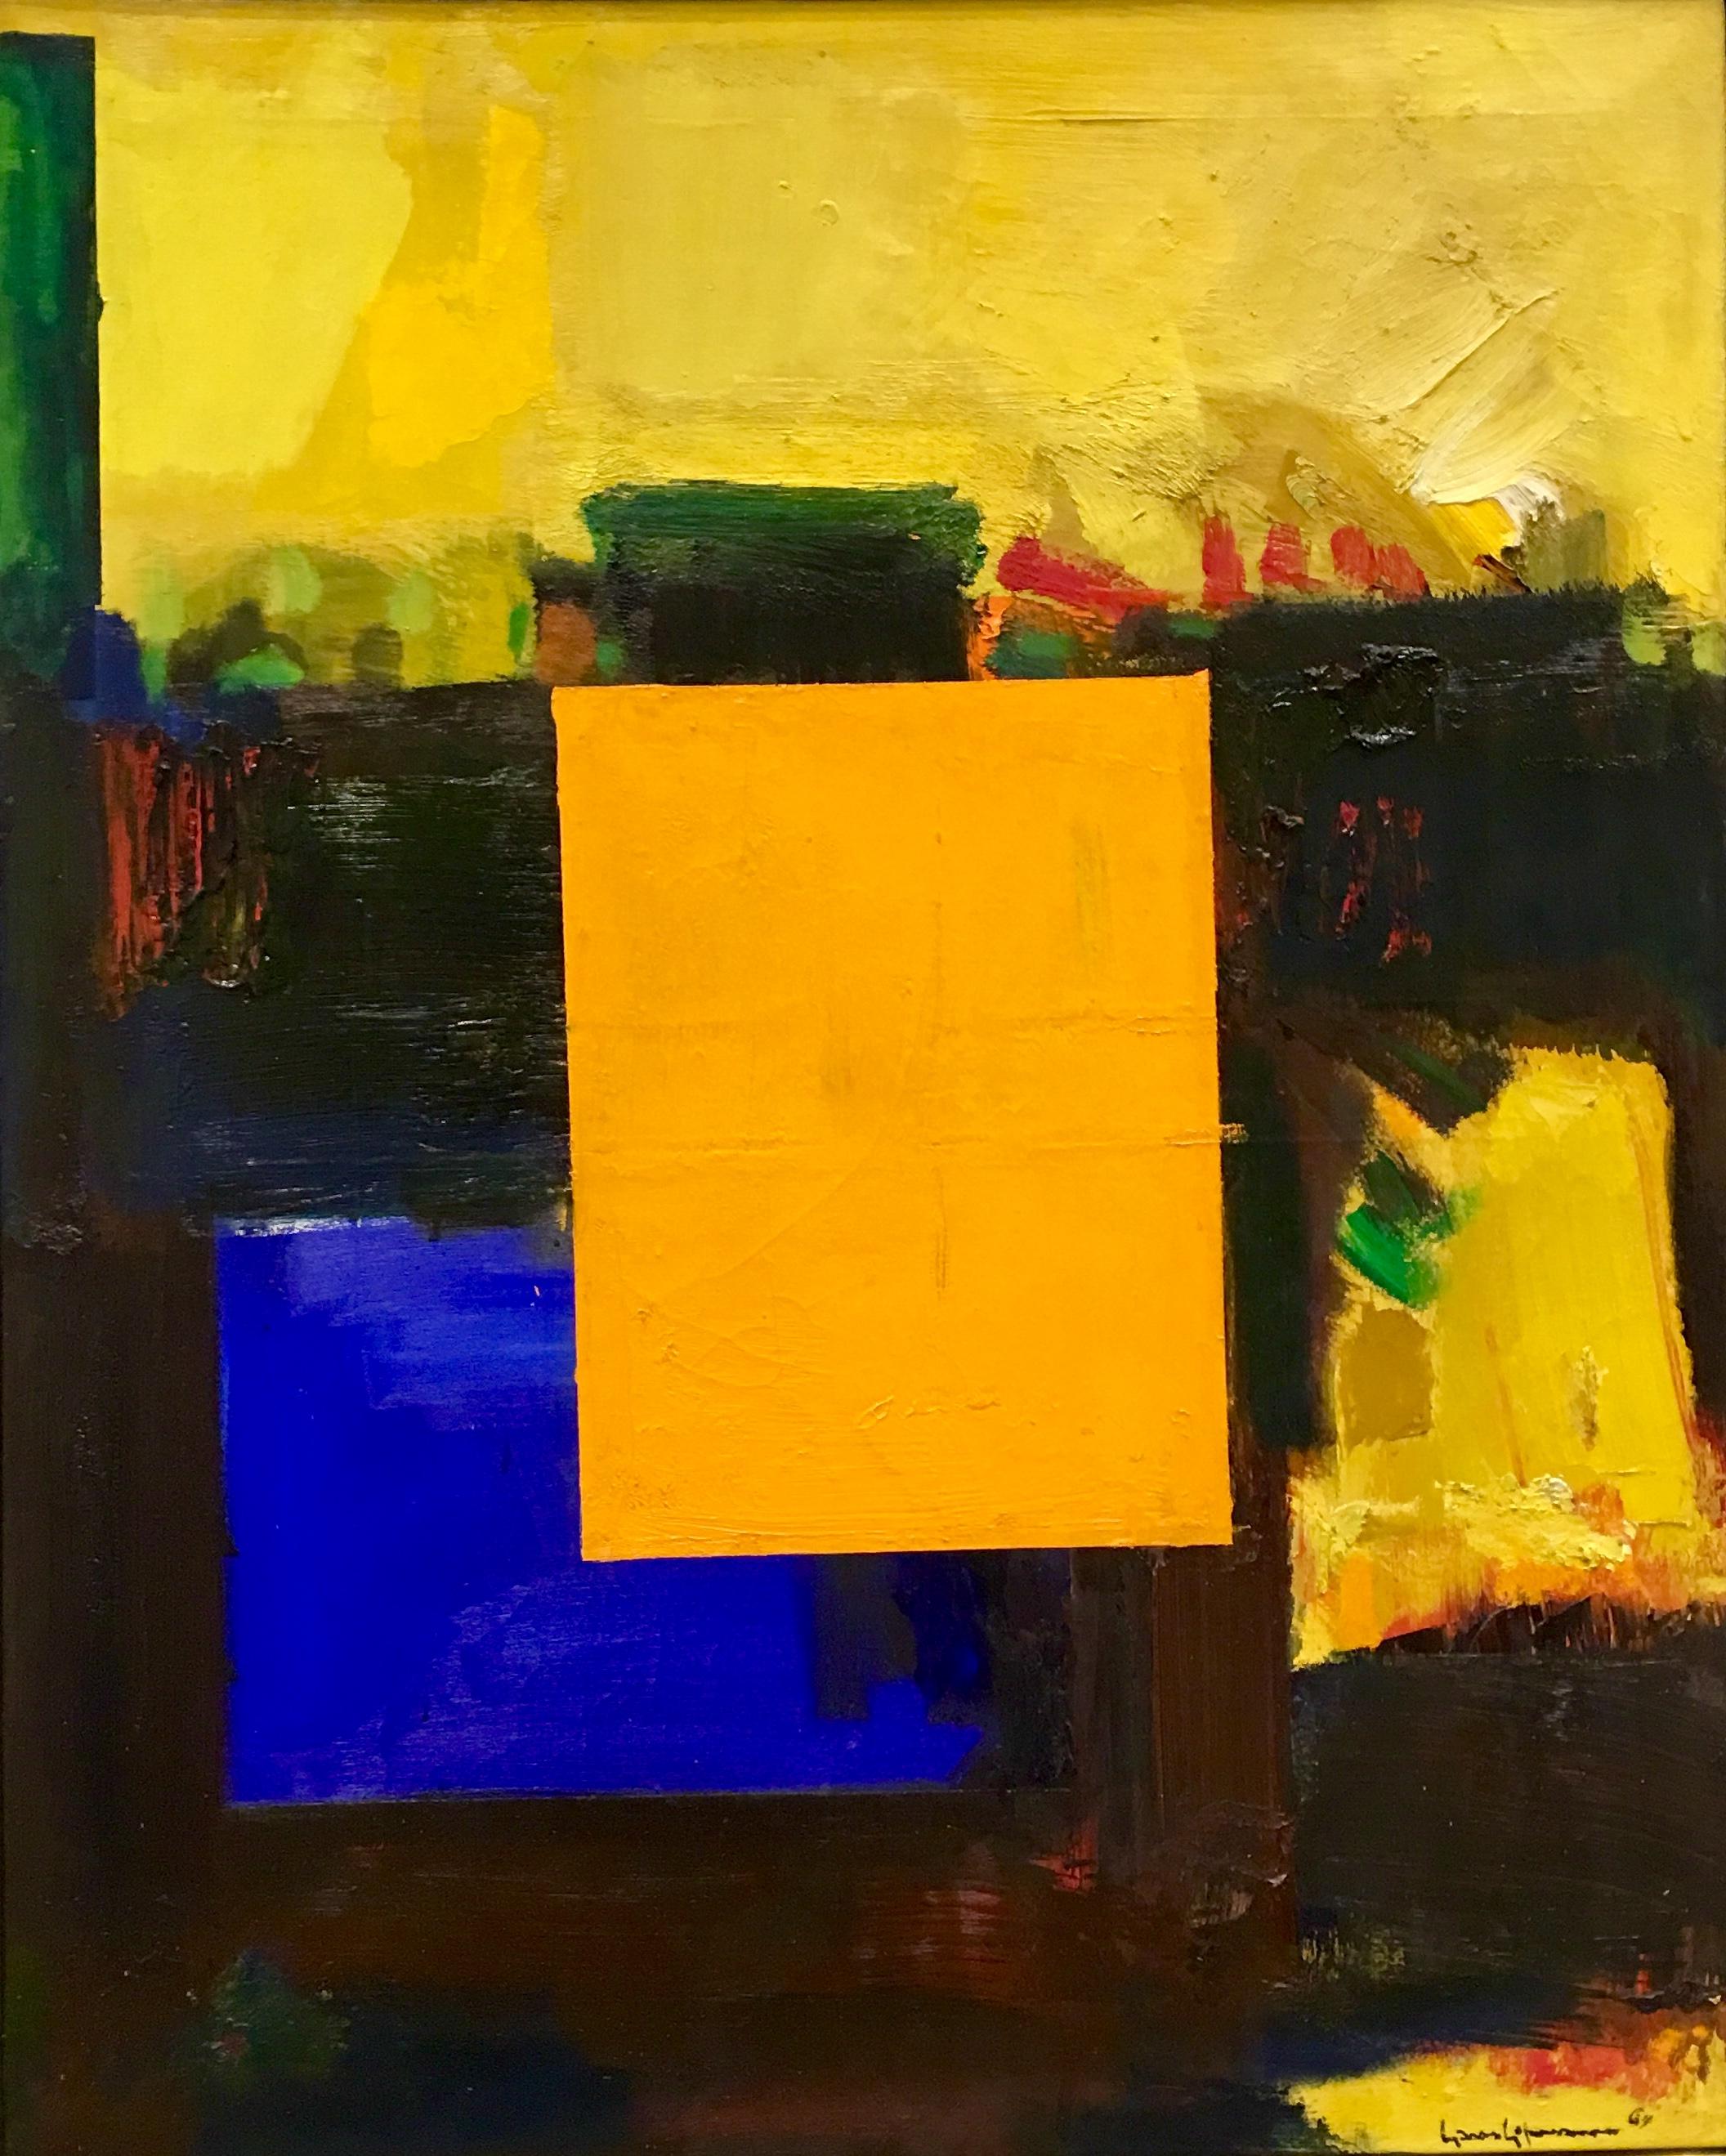 Ora Pro Nobis (Pray for Us), oil on canvas, 1964, Hans Hoffman, (photograph J. Cook)